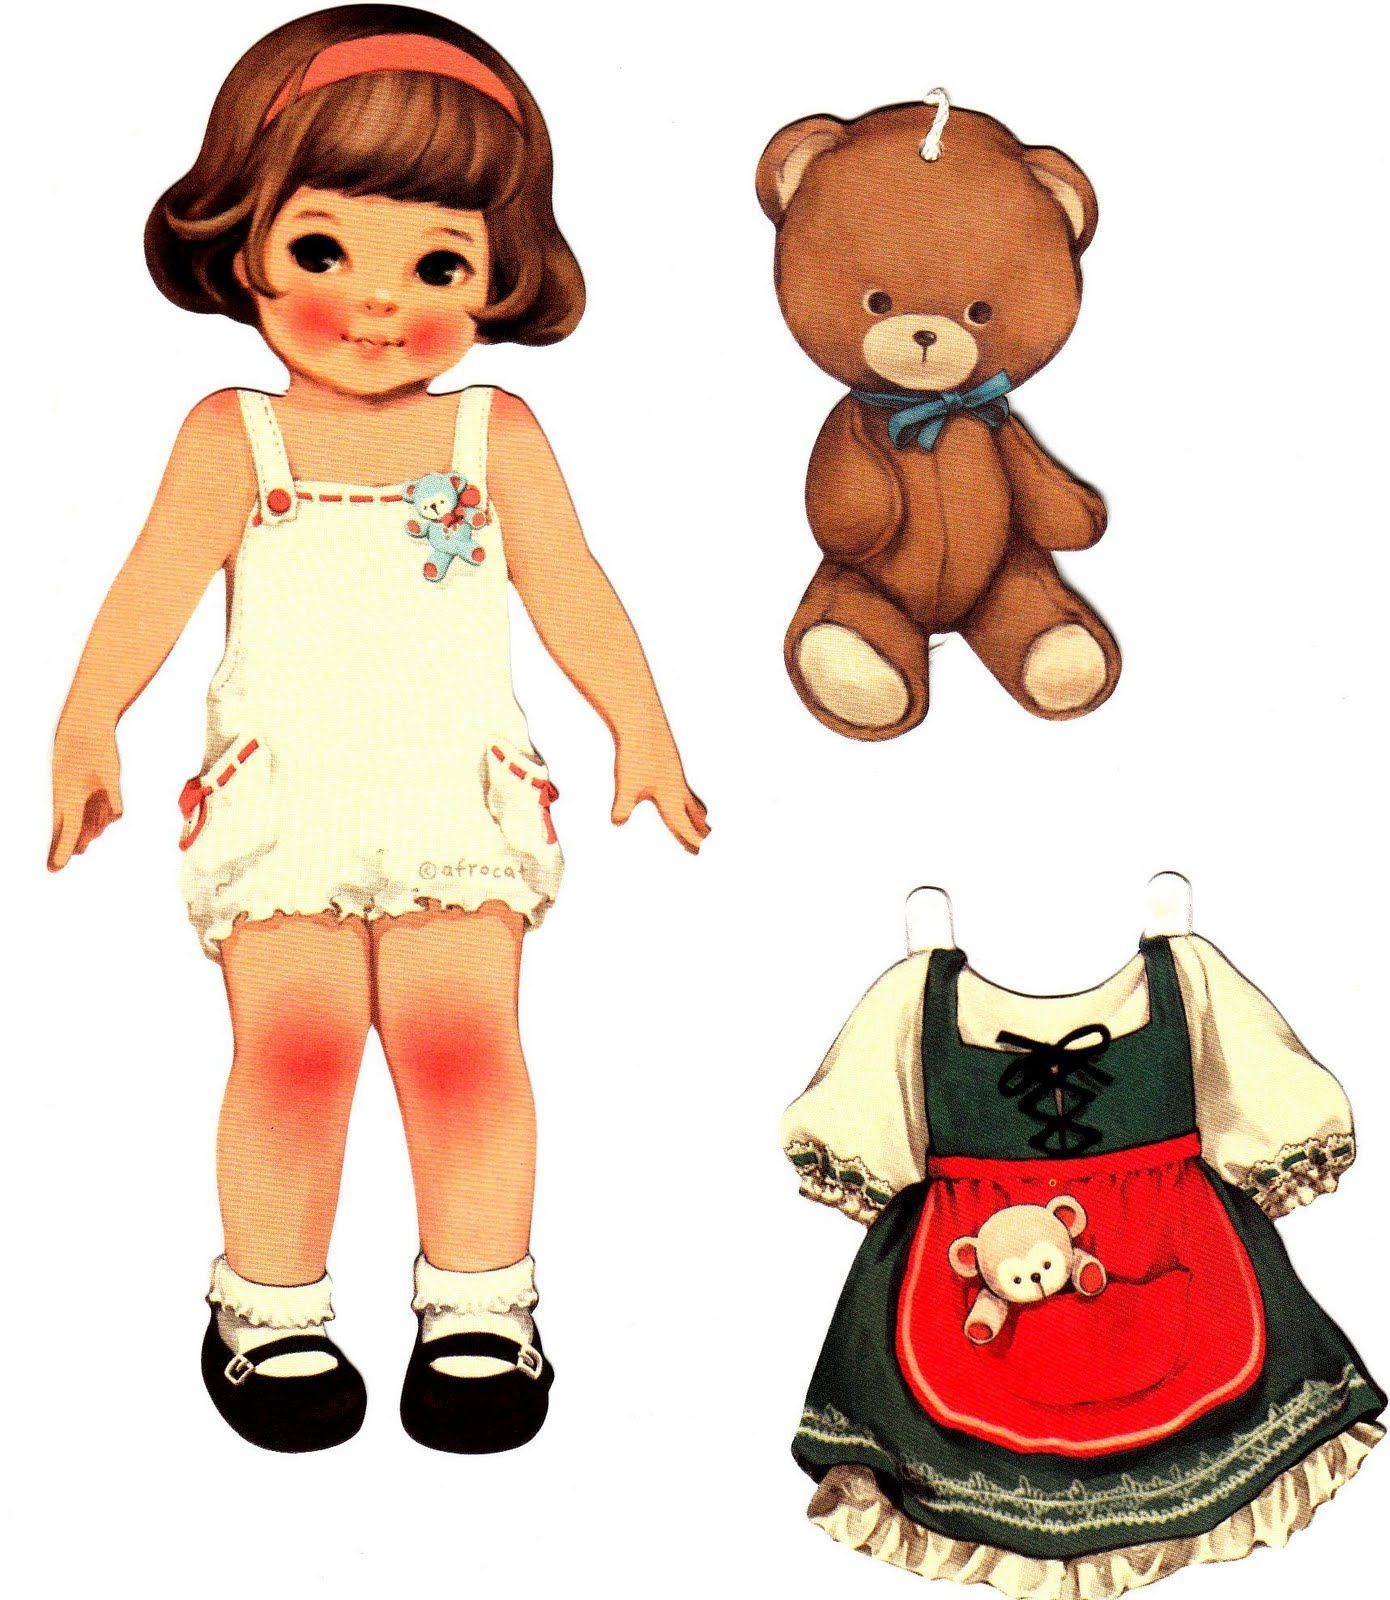 LITTLE GIRL with TEDDY BEAR | PAPER DOLLS | Pinterest ...